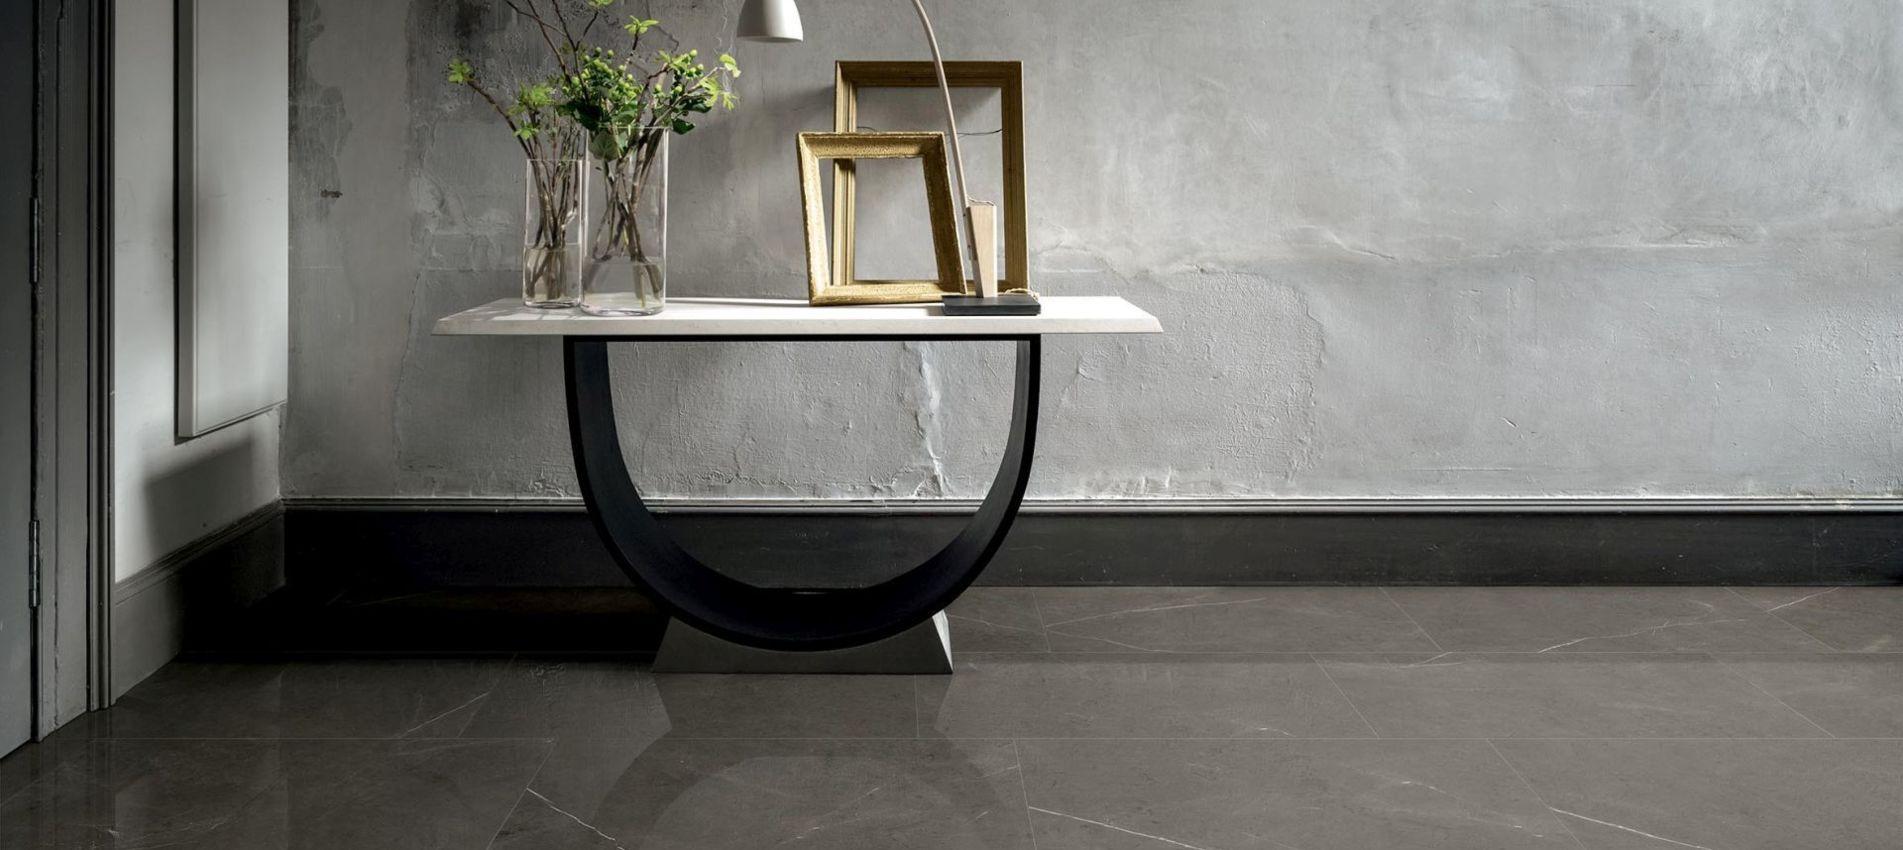 London Designer Tiles, Essex Designer Tiles, Suffolk Designer Tiles